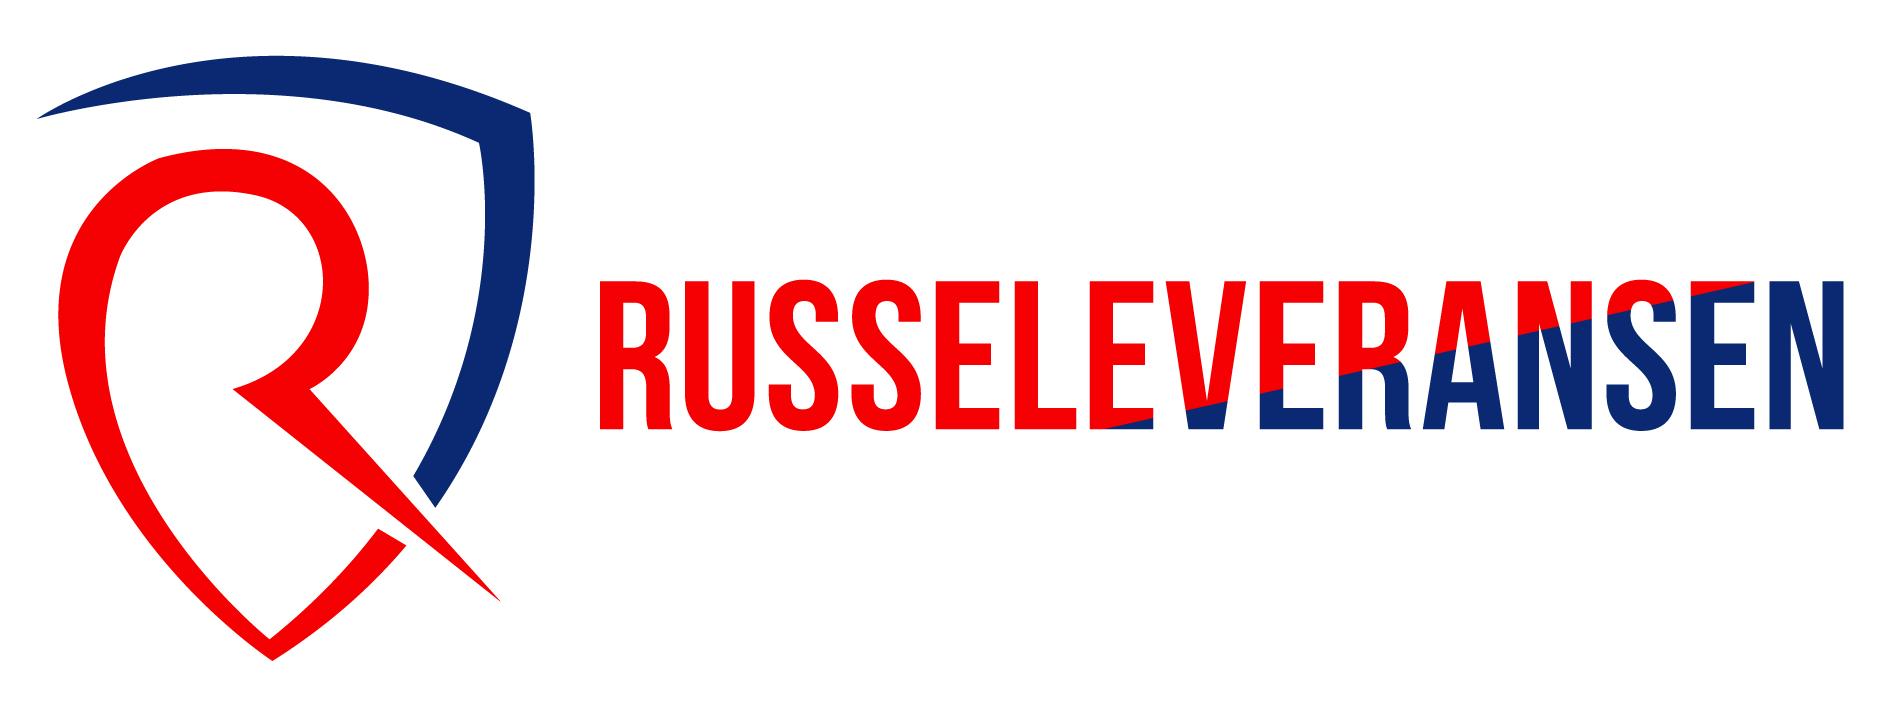 Russeleveransen.no